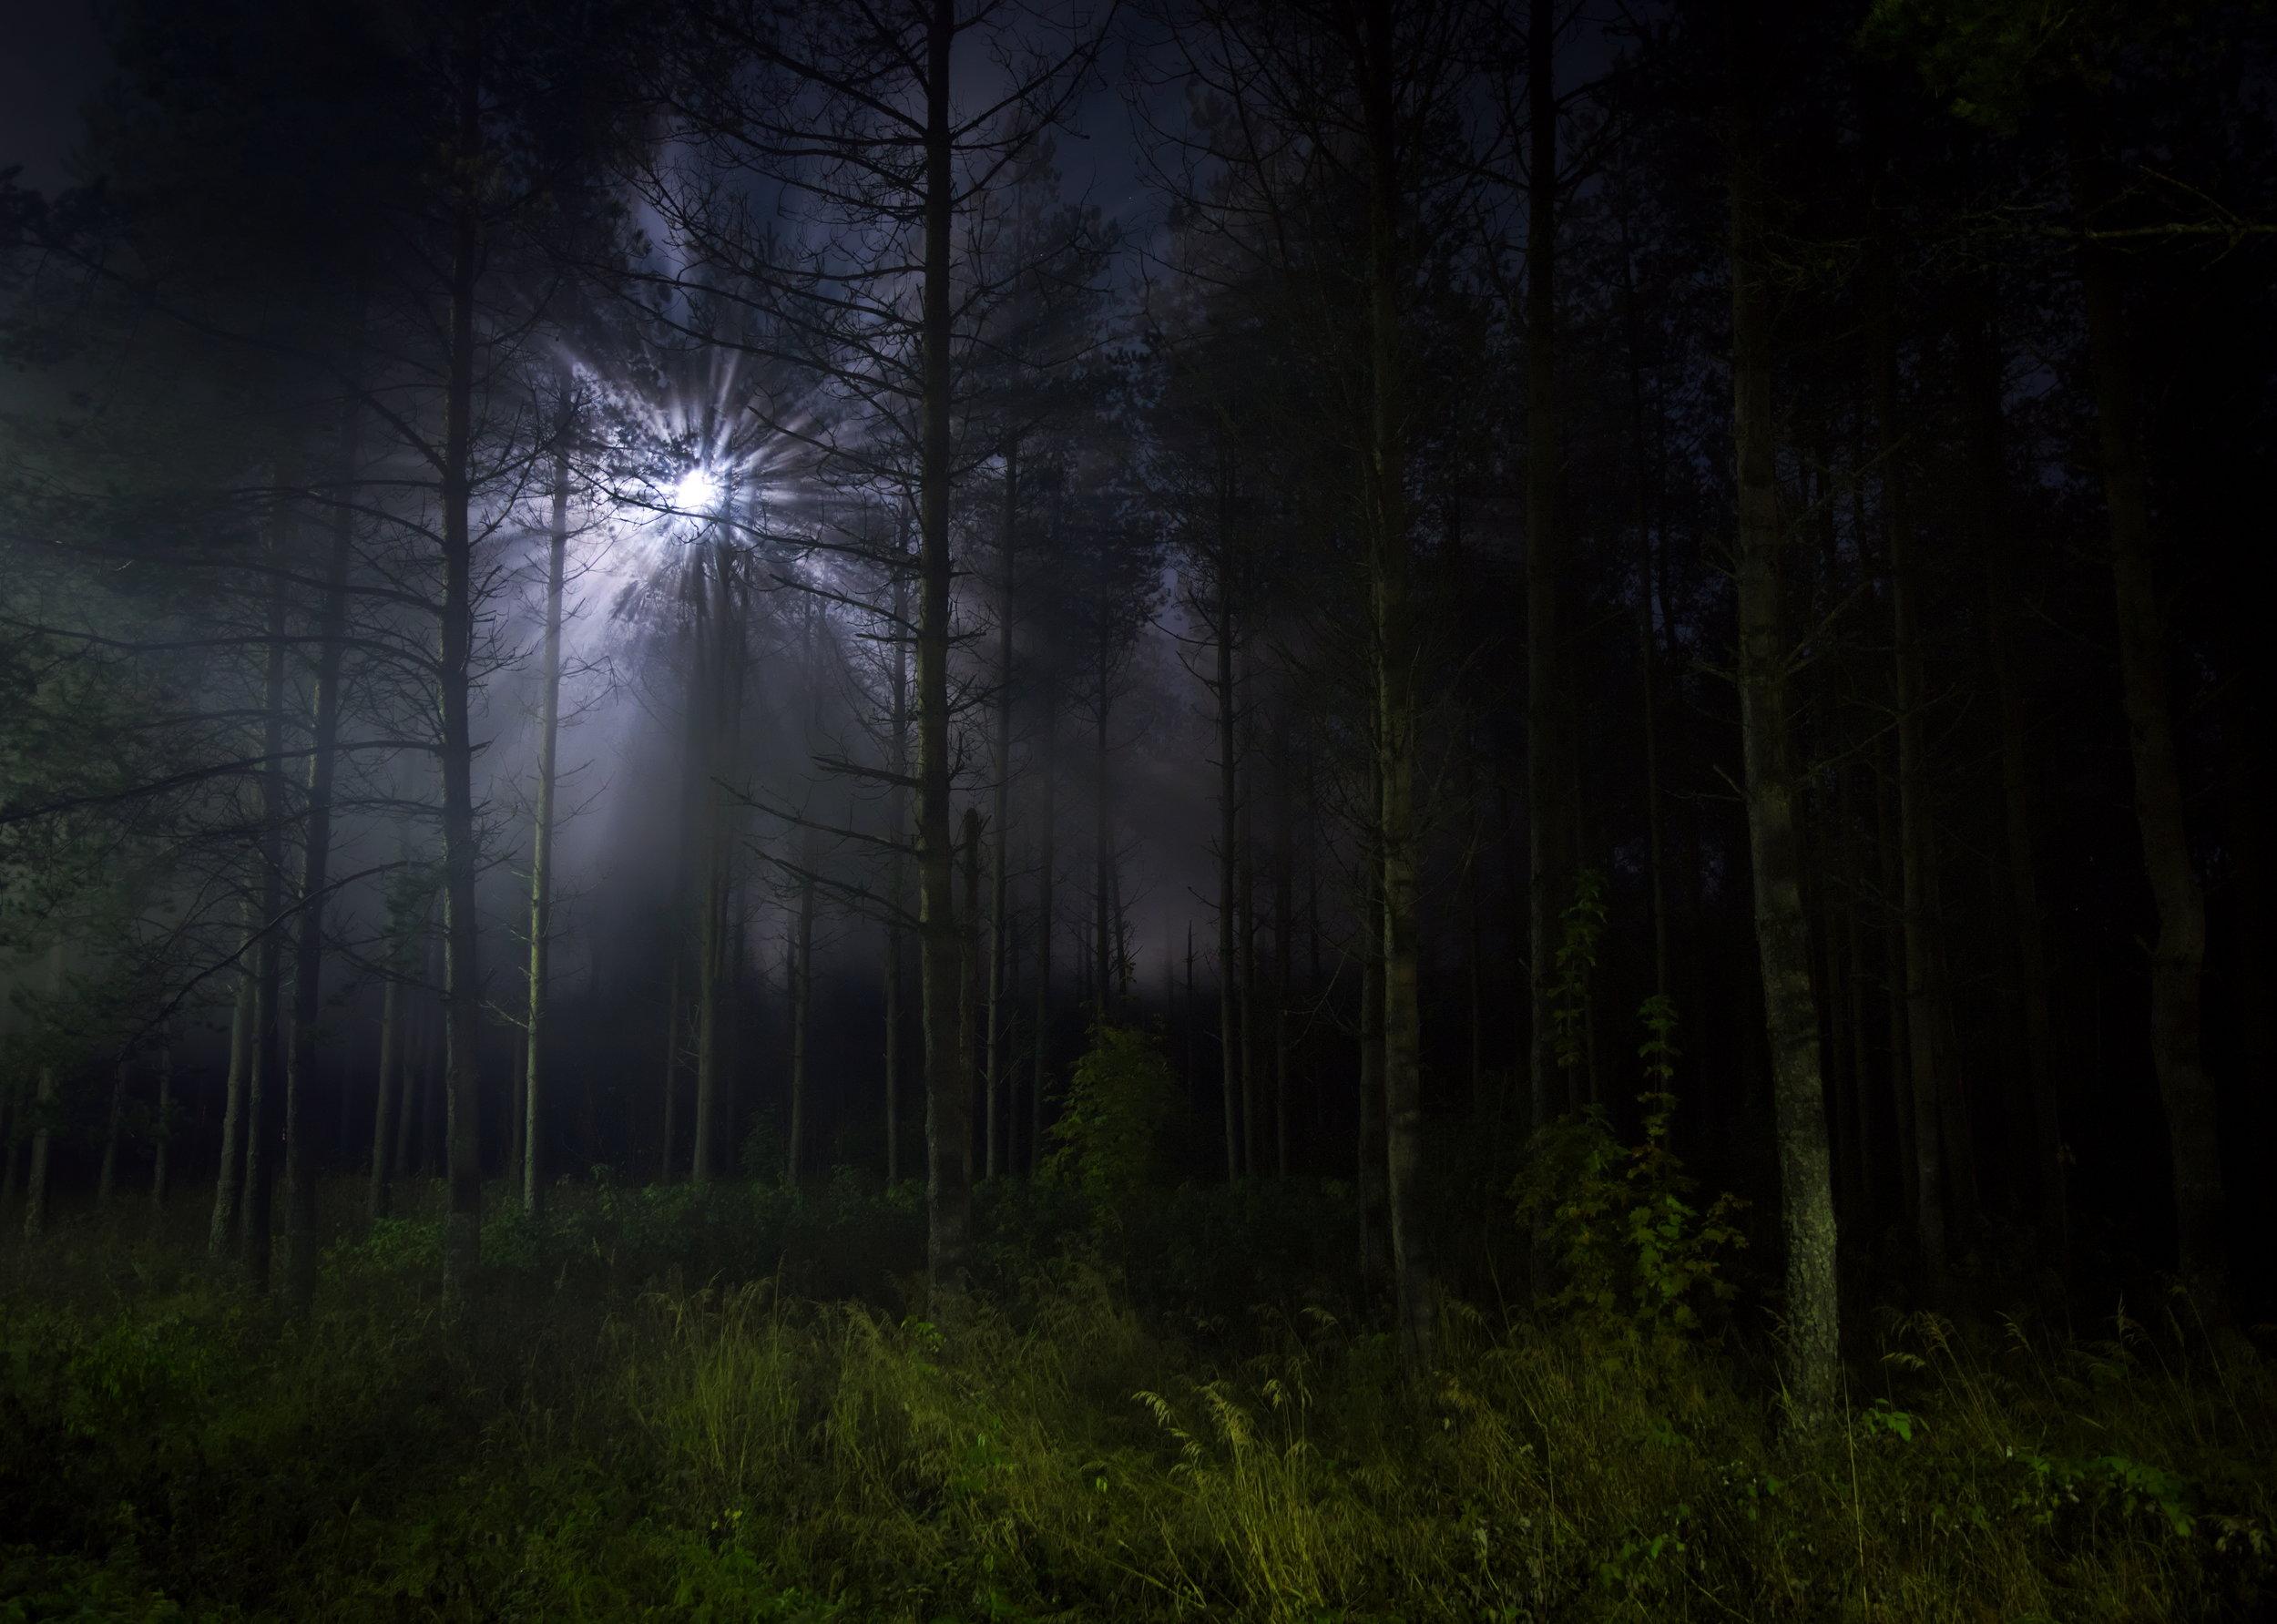 Moonlight in the Dark Forest